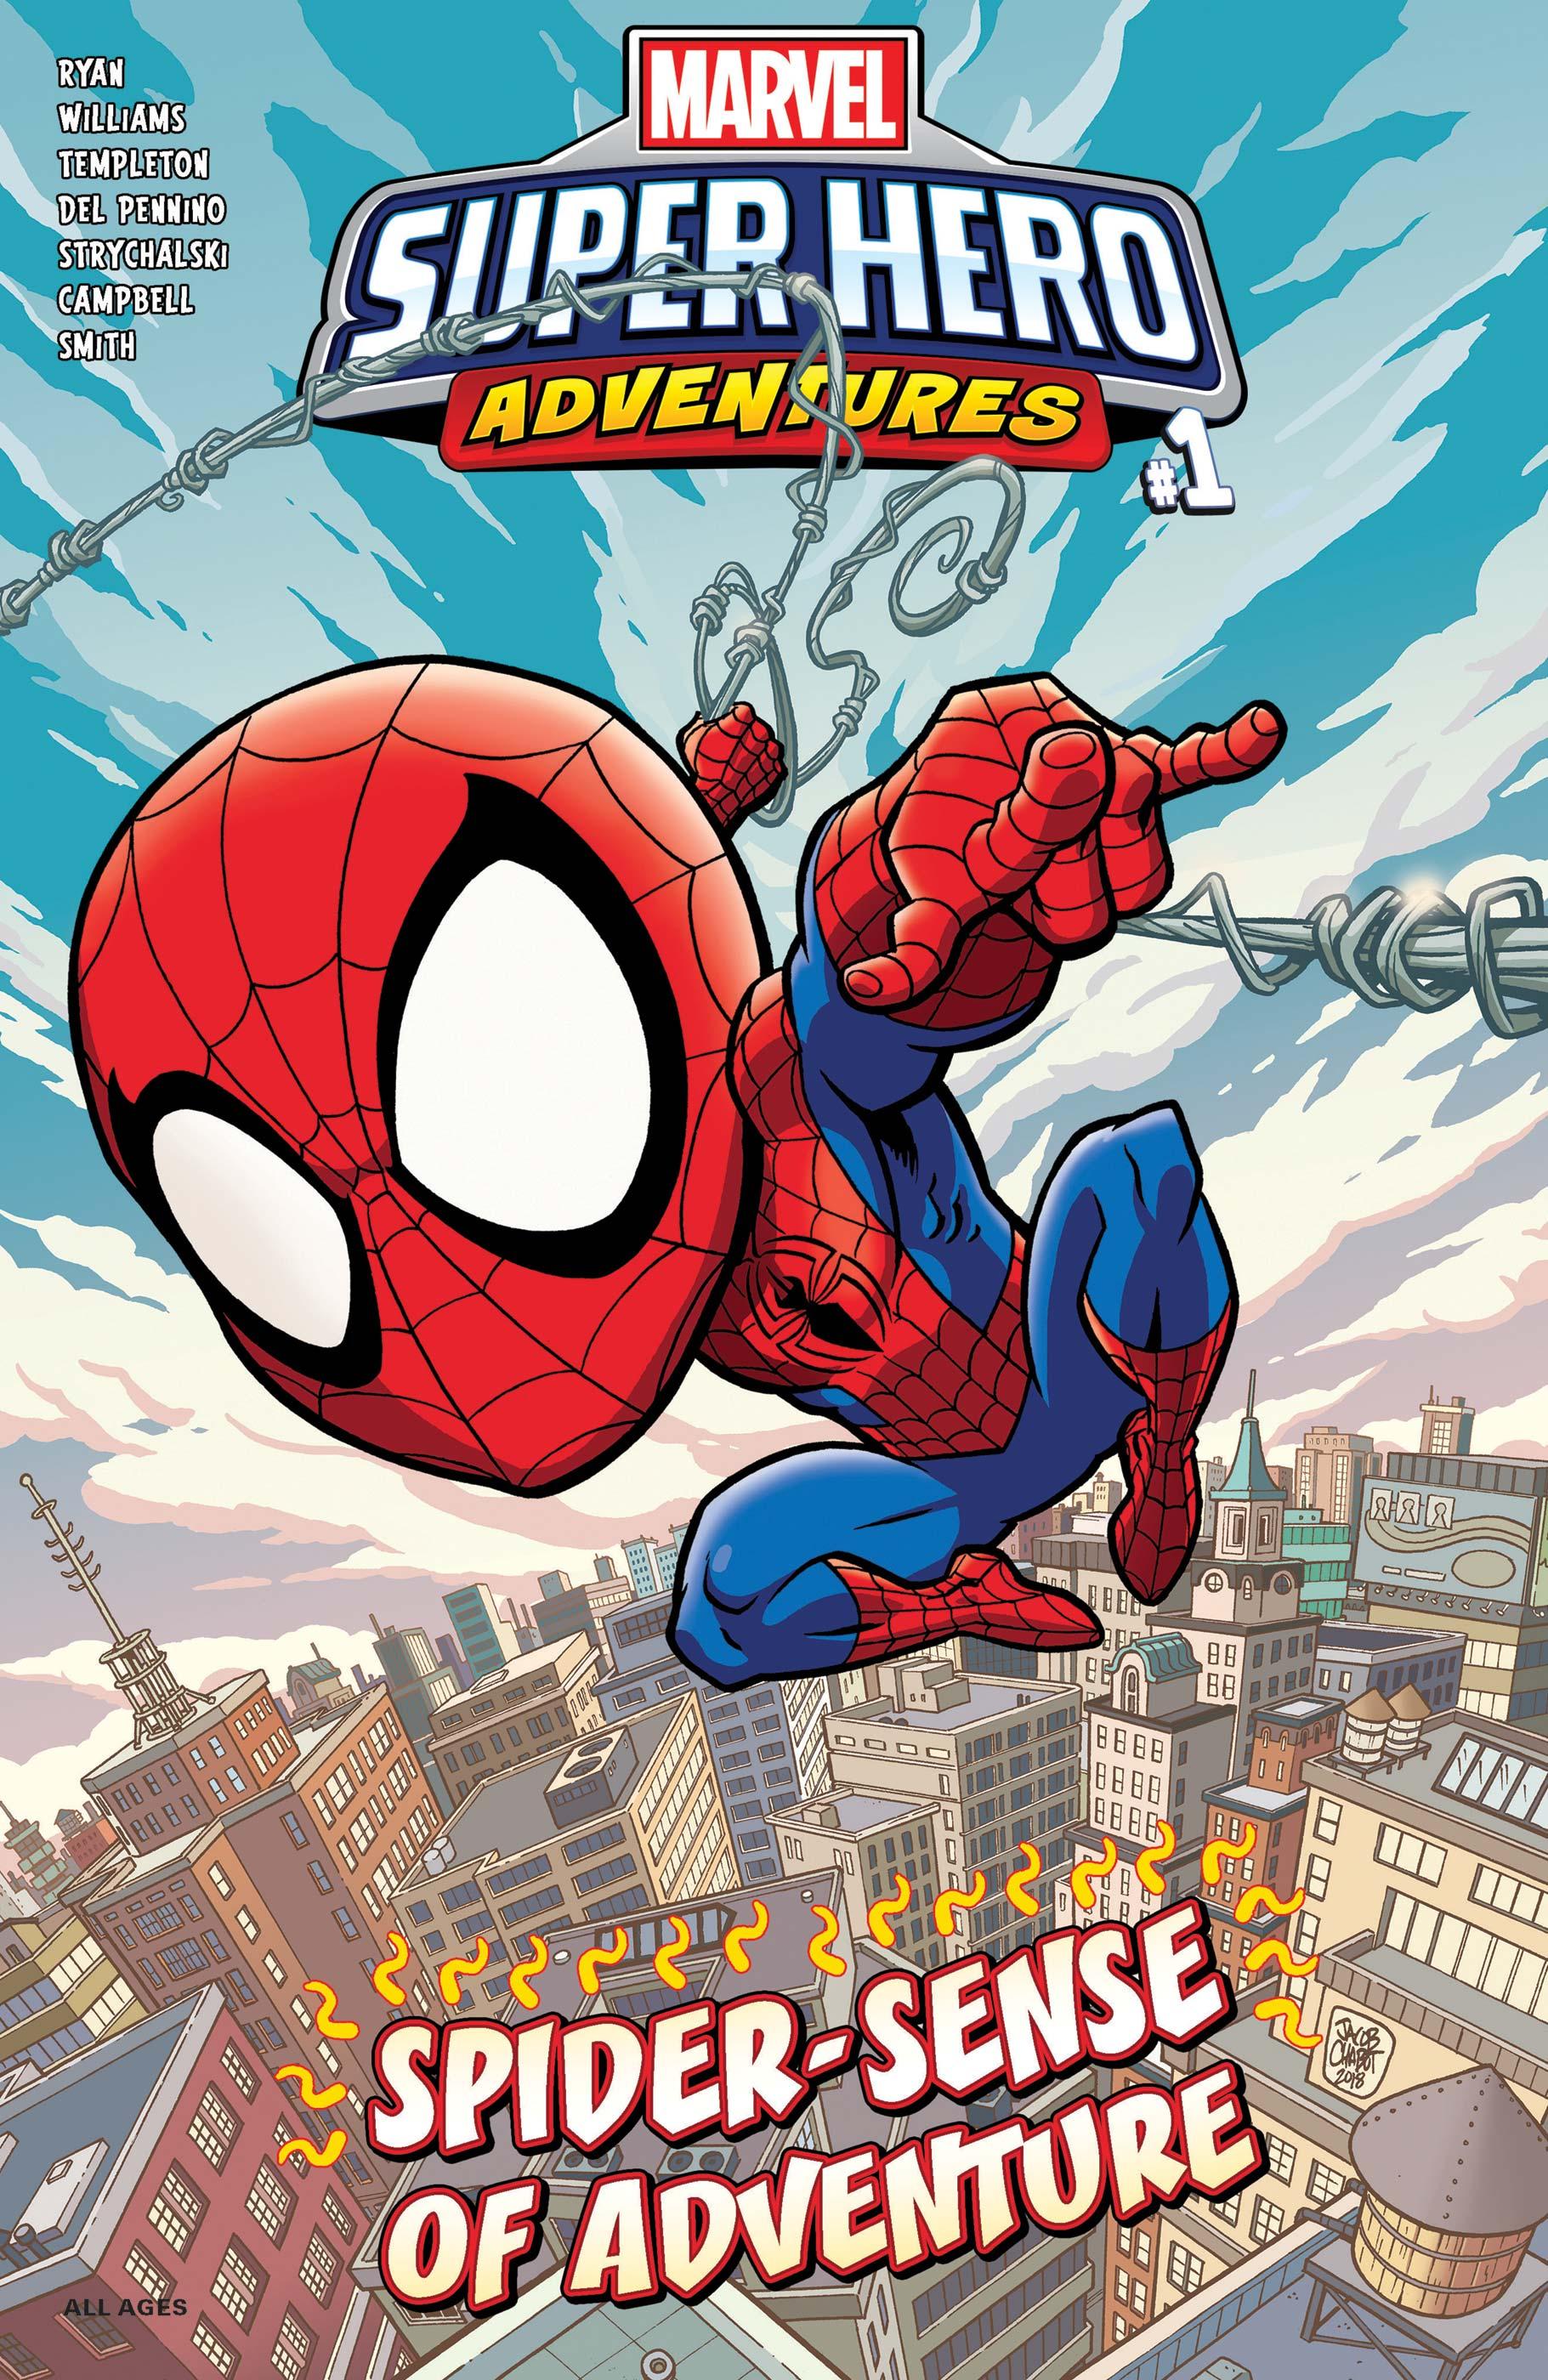 Marvel Super Hero Adventures: Spider-Man - Spider-Sense of Adventure (2019) #1